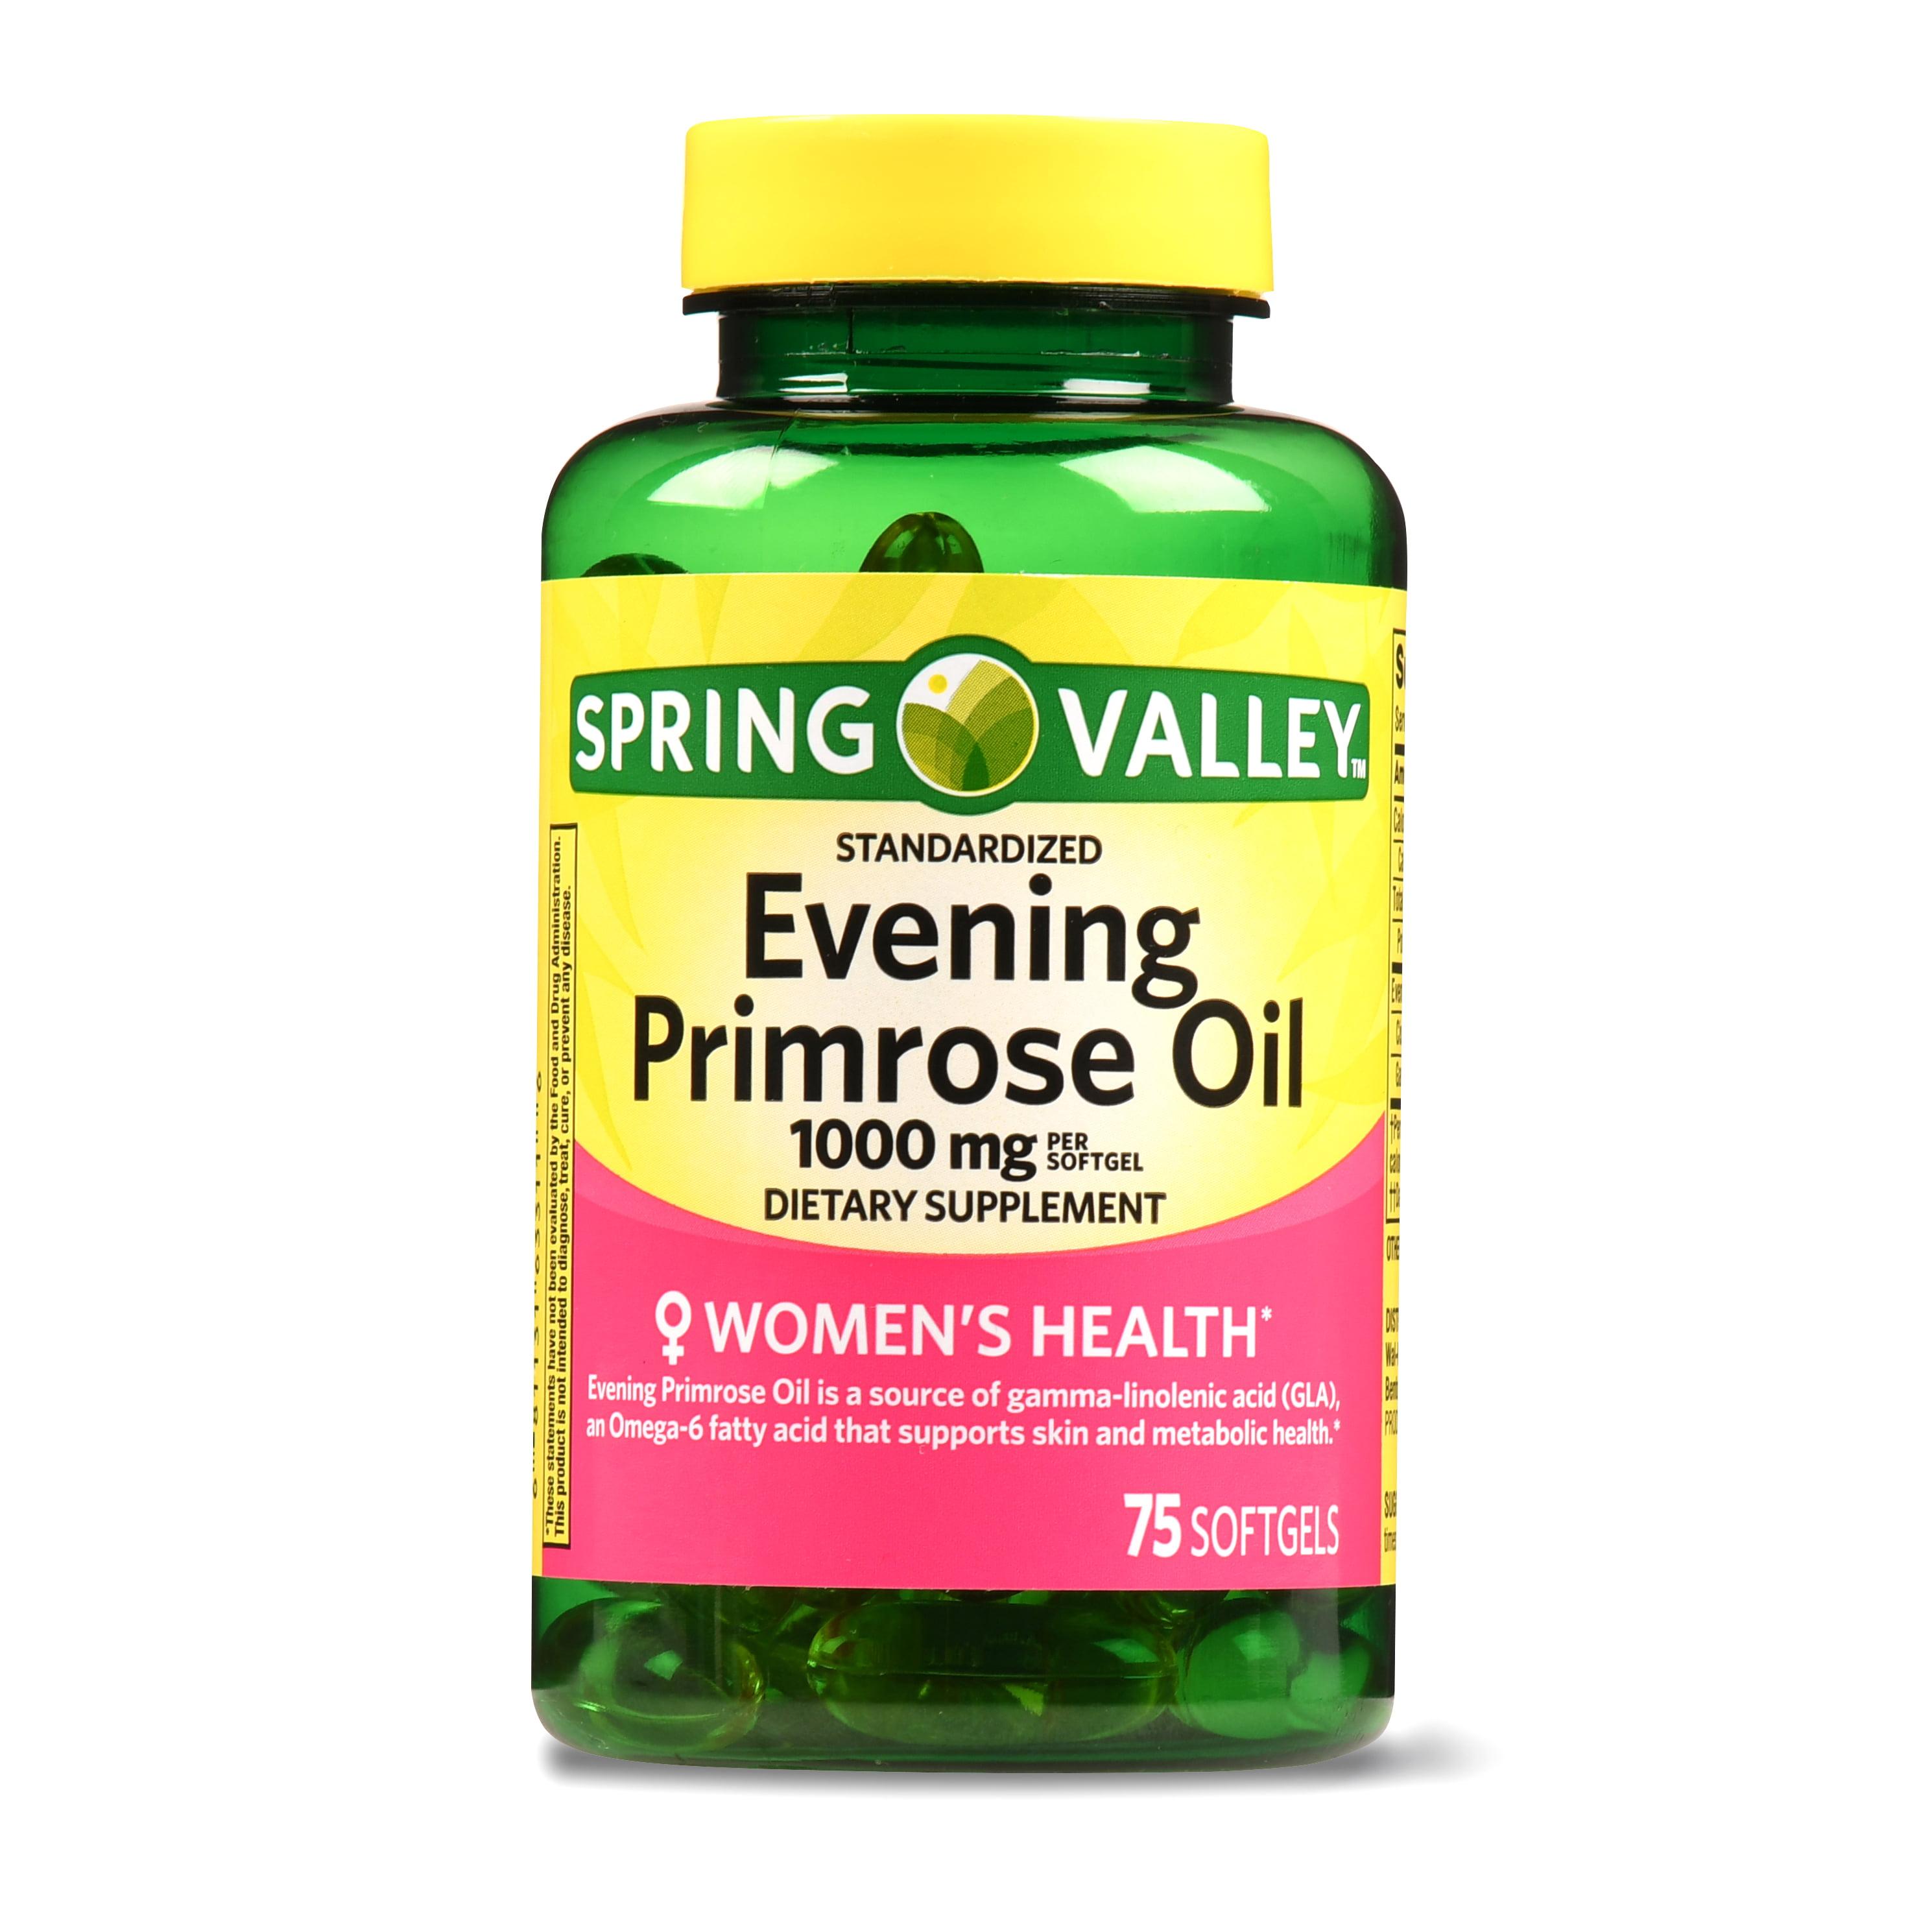 Spring Valley Women's Health Evening Primrose Oil Softgels, 1000 mg, 75 Ct